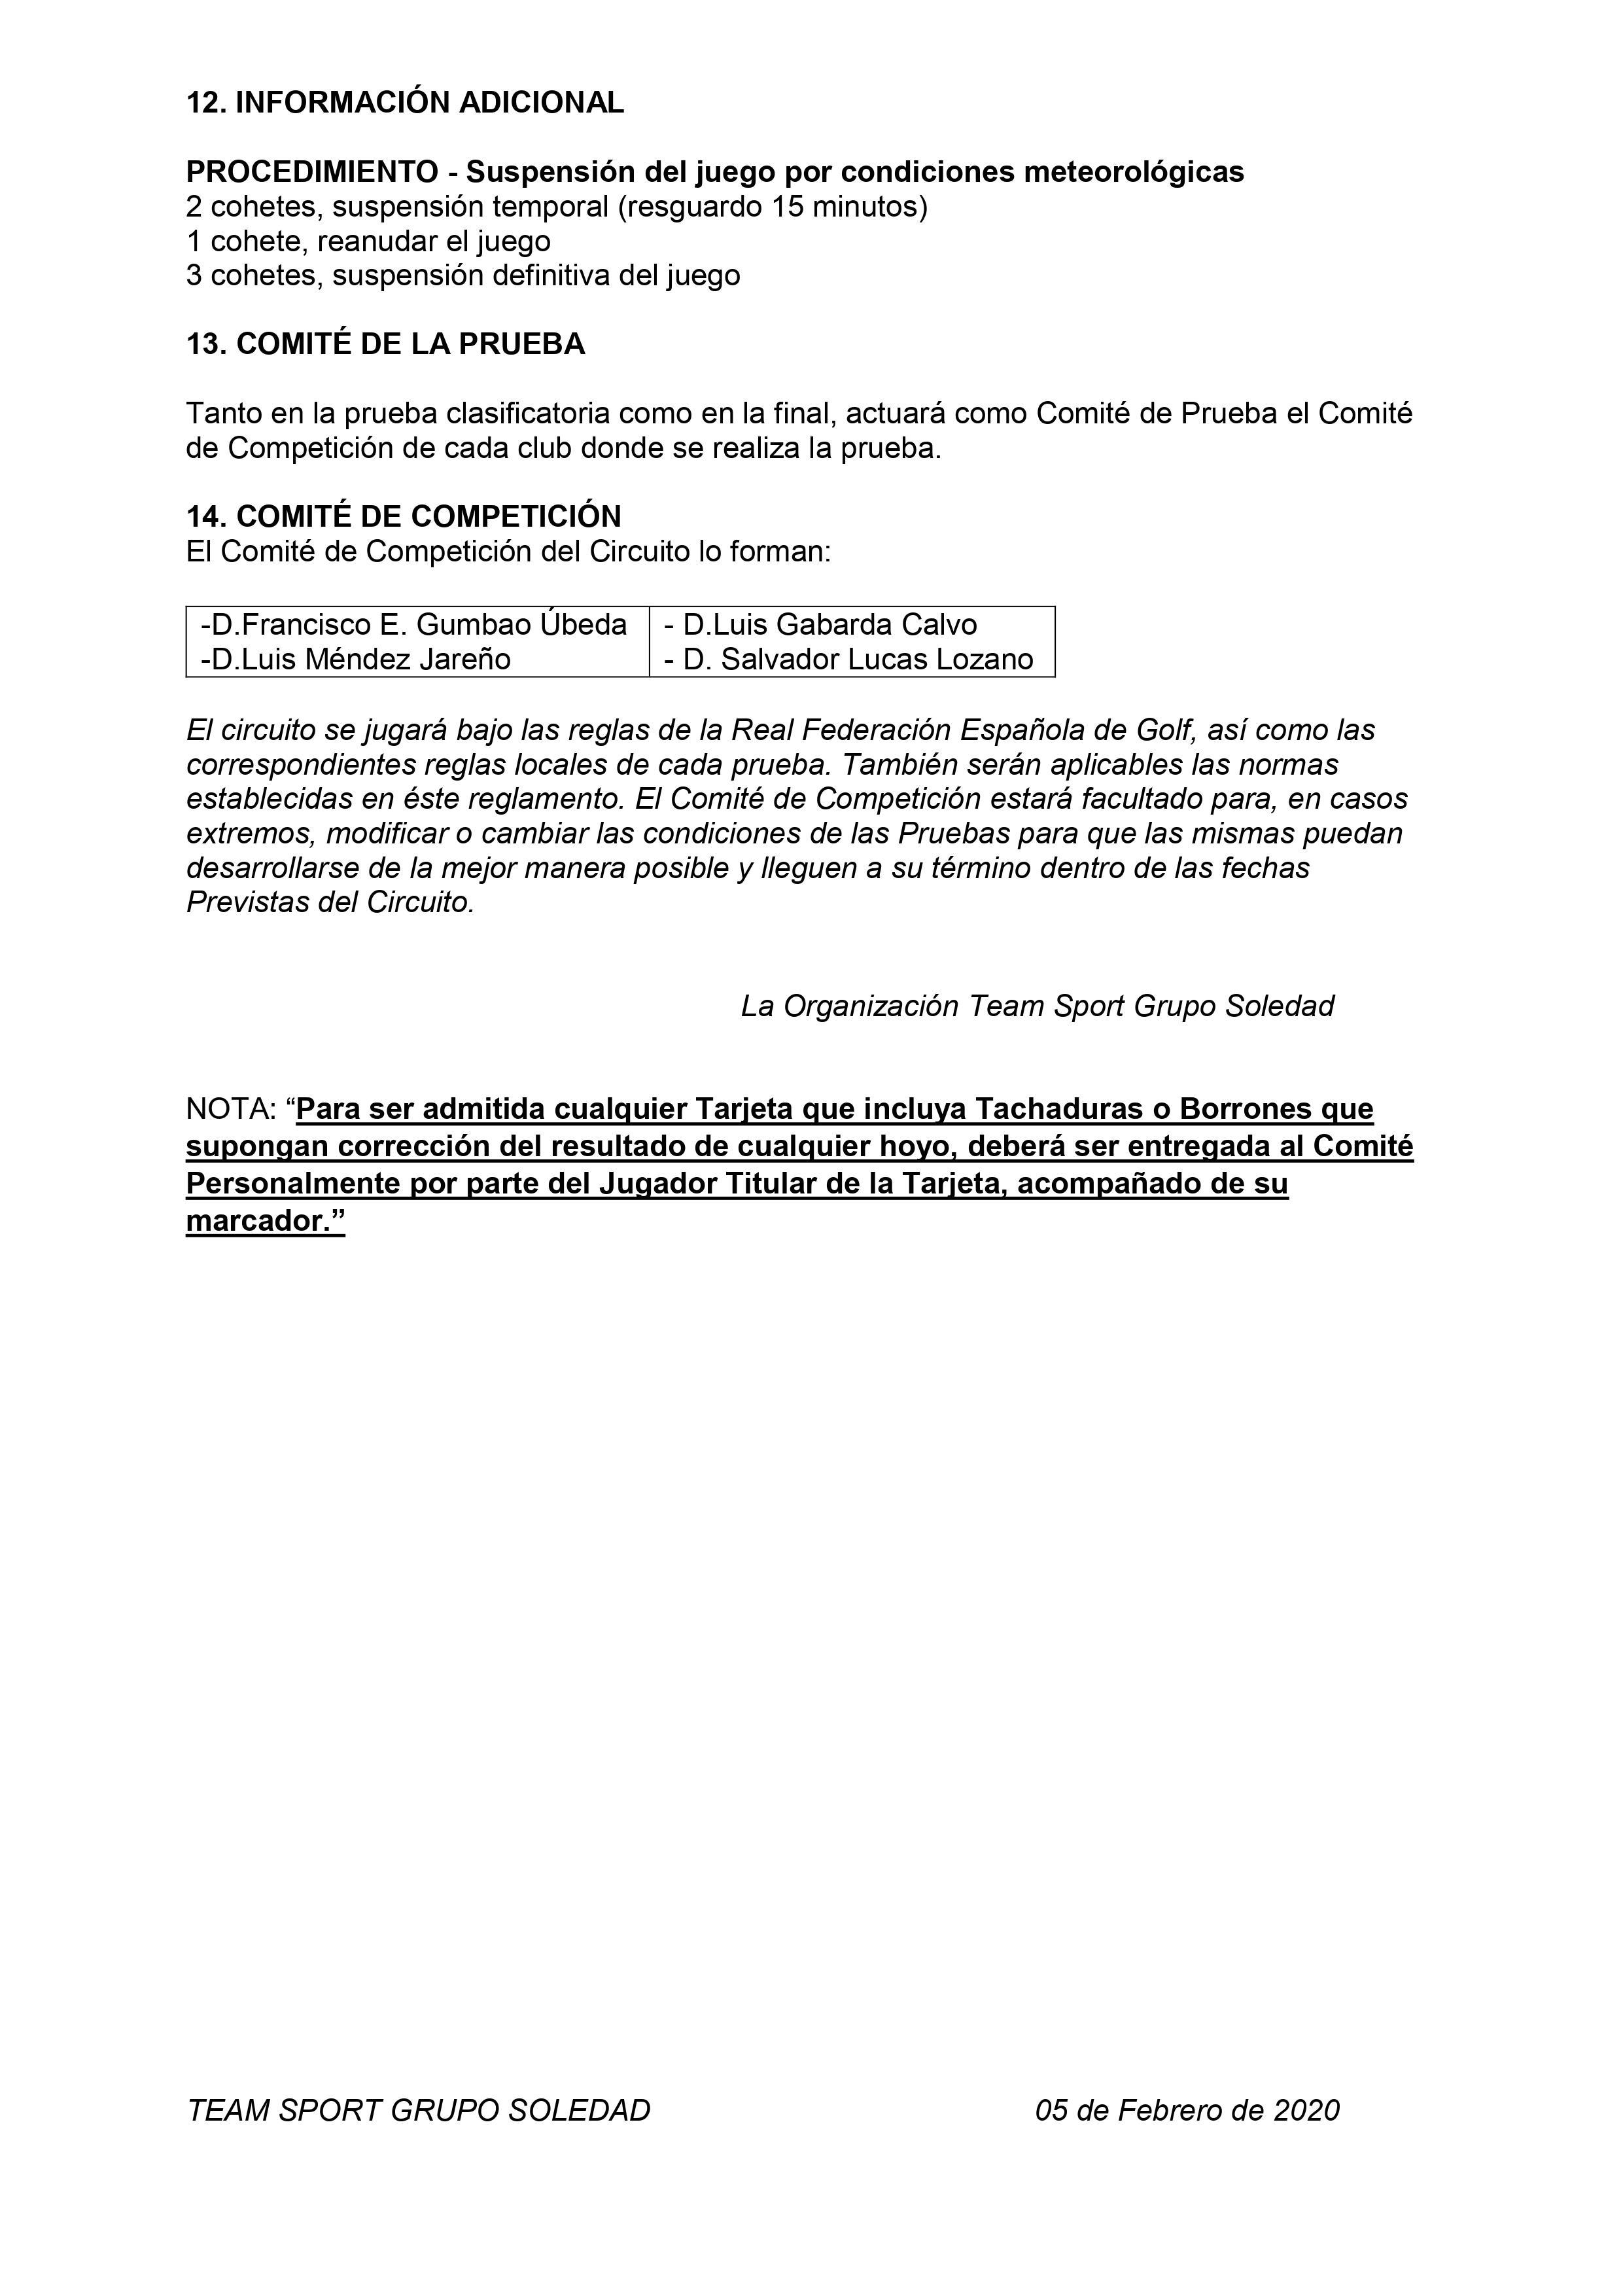 200328 PLA, Reglamento del circuito (4)